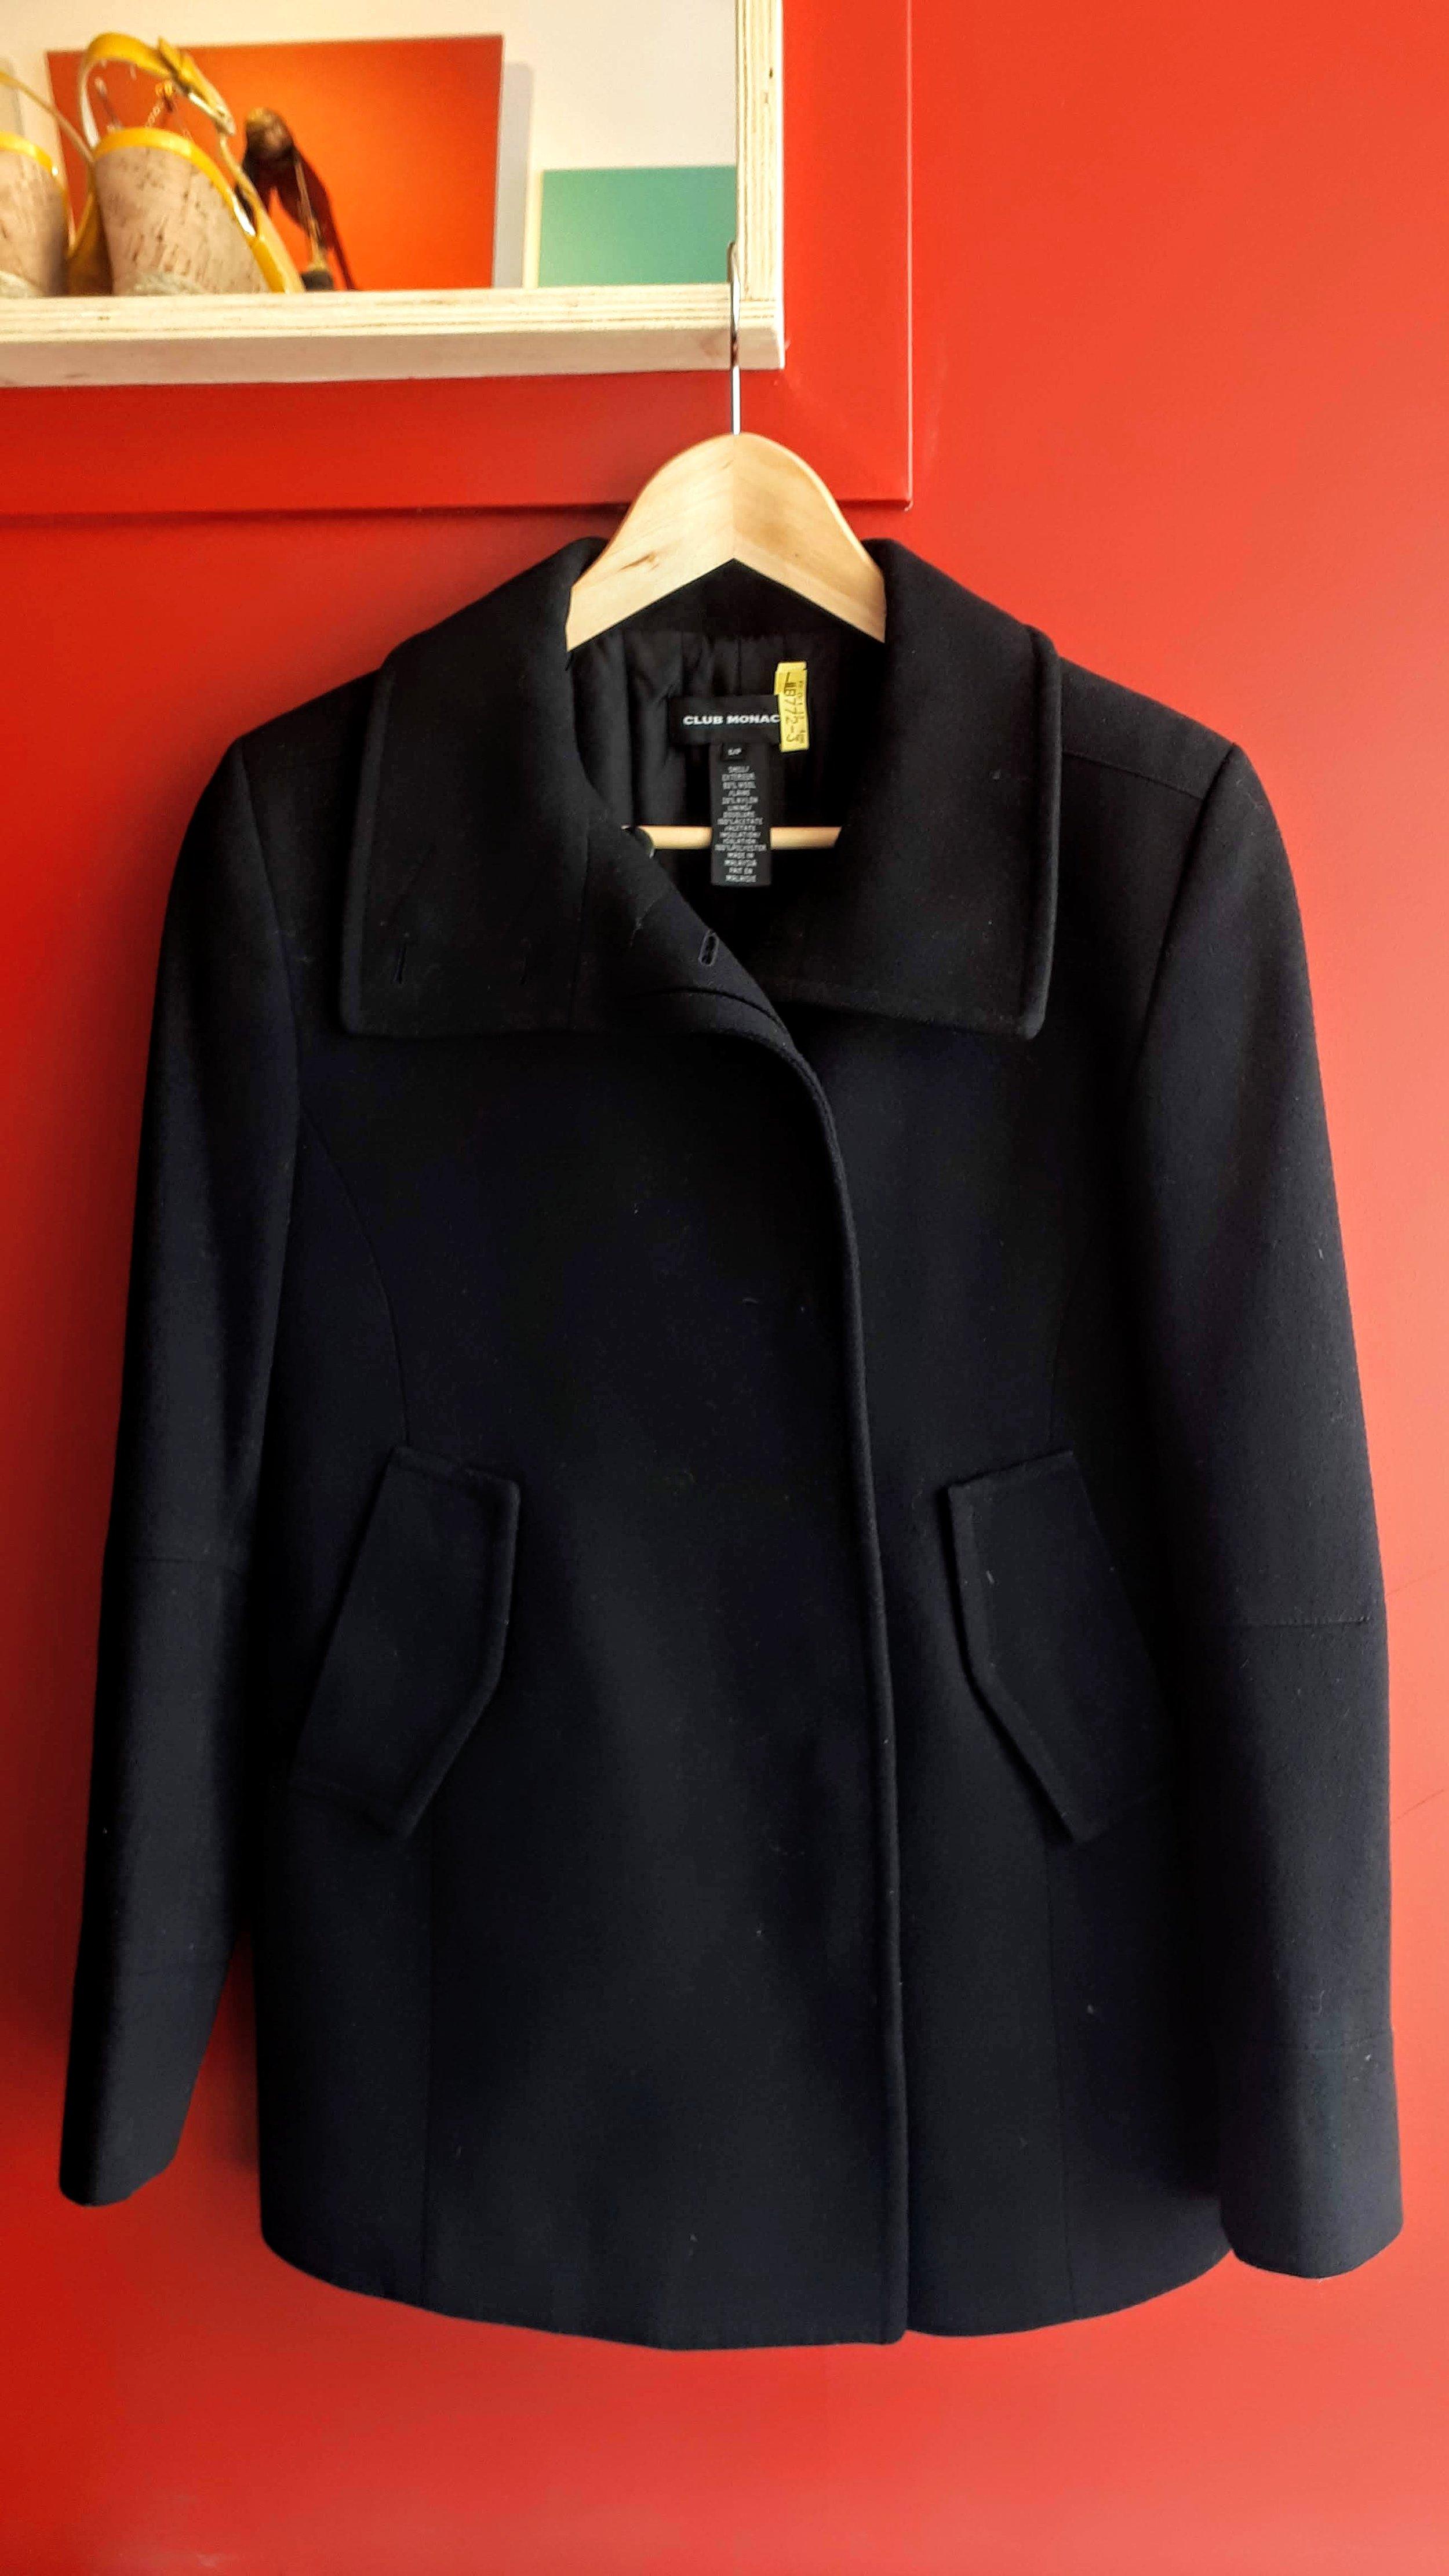 Club Monaco coat; Size S, $40 (on sale for $20!)